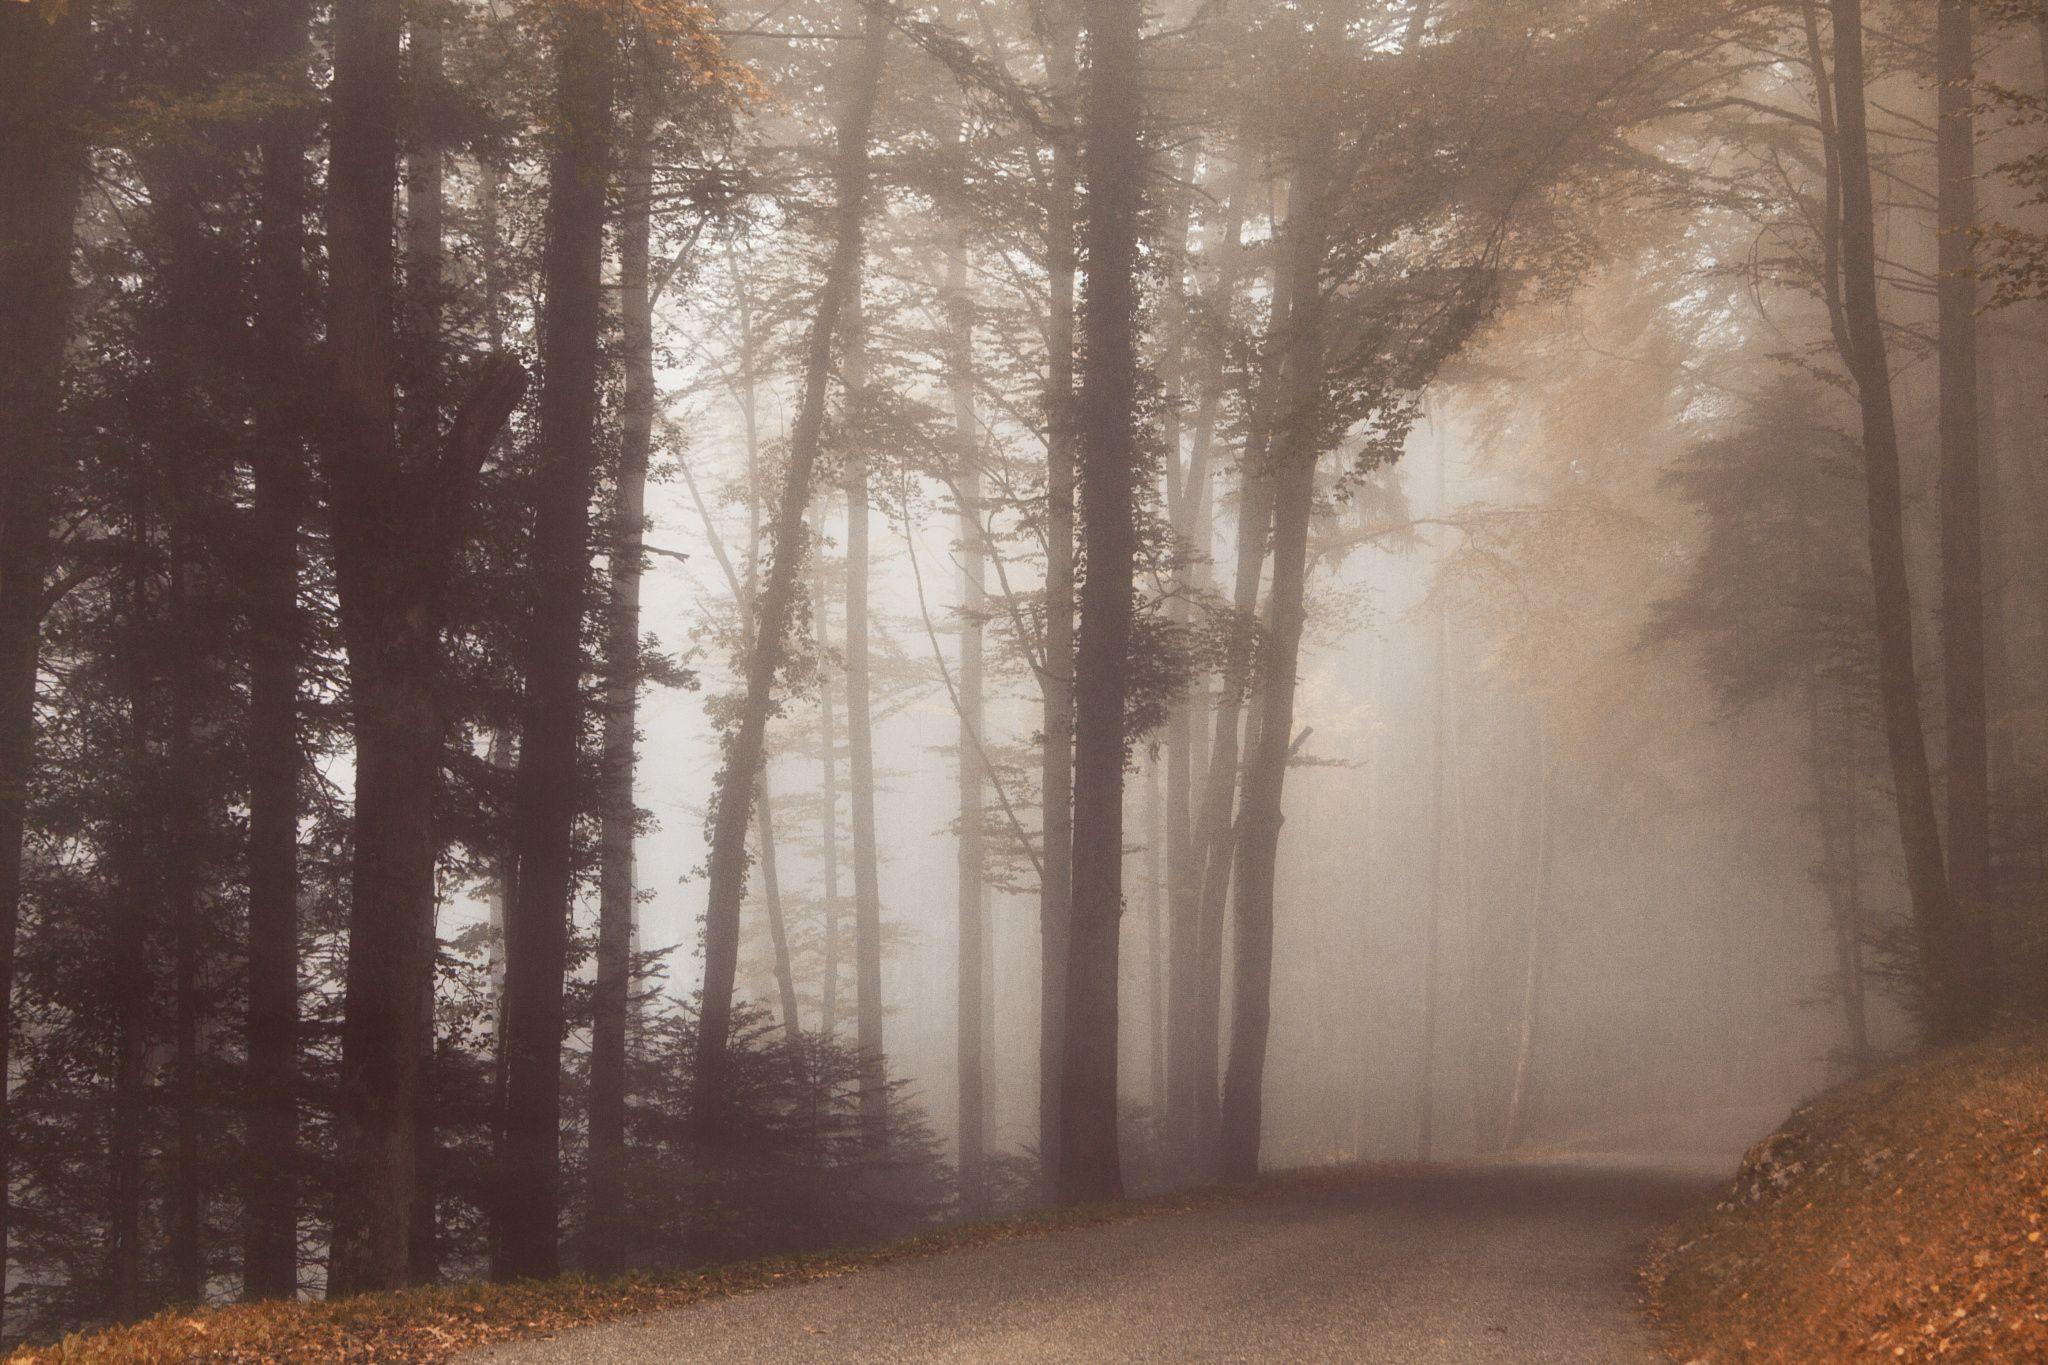 balade par temps de brouillard à Montvoie